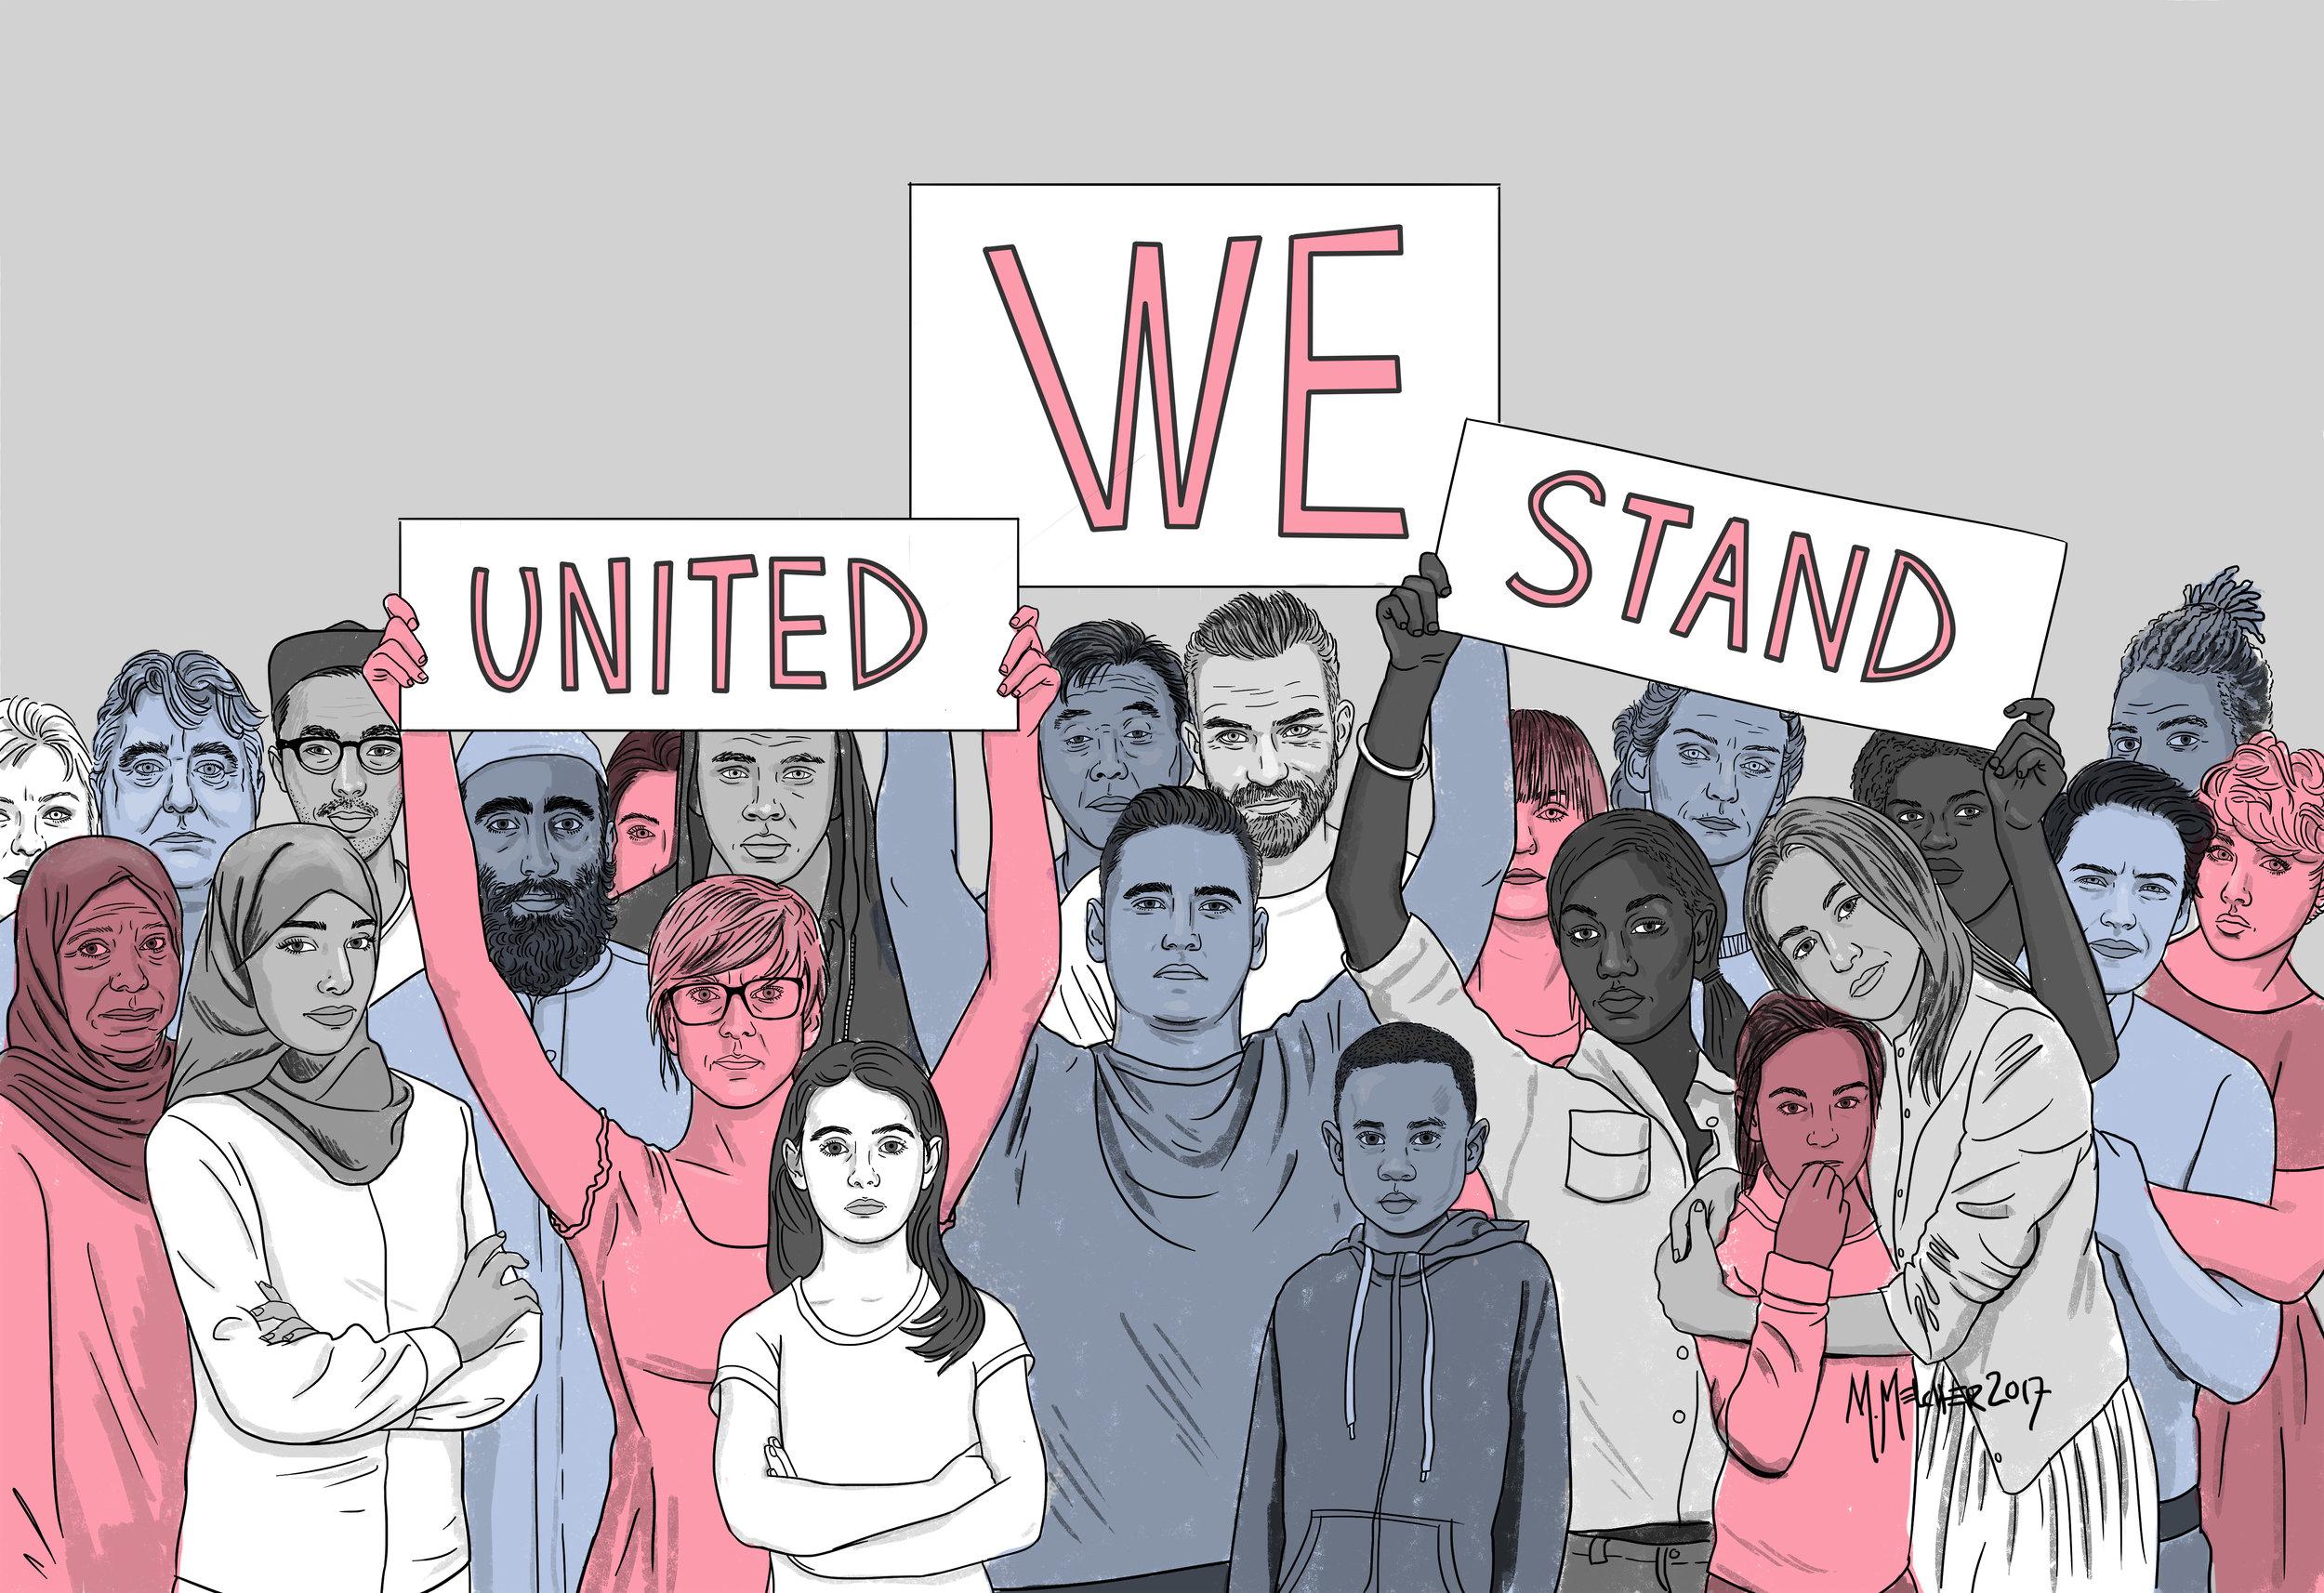 United We Stand - Hi Res 300 DPI